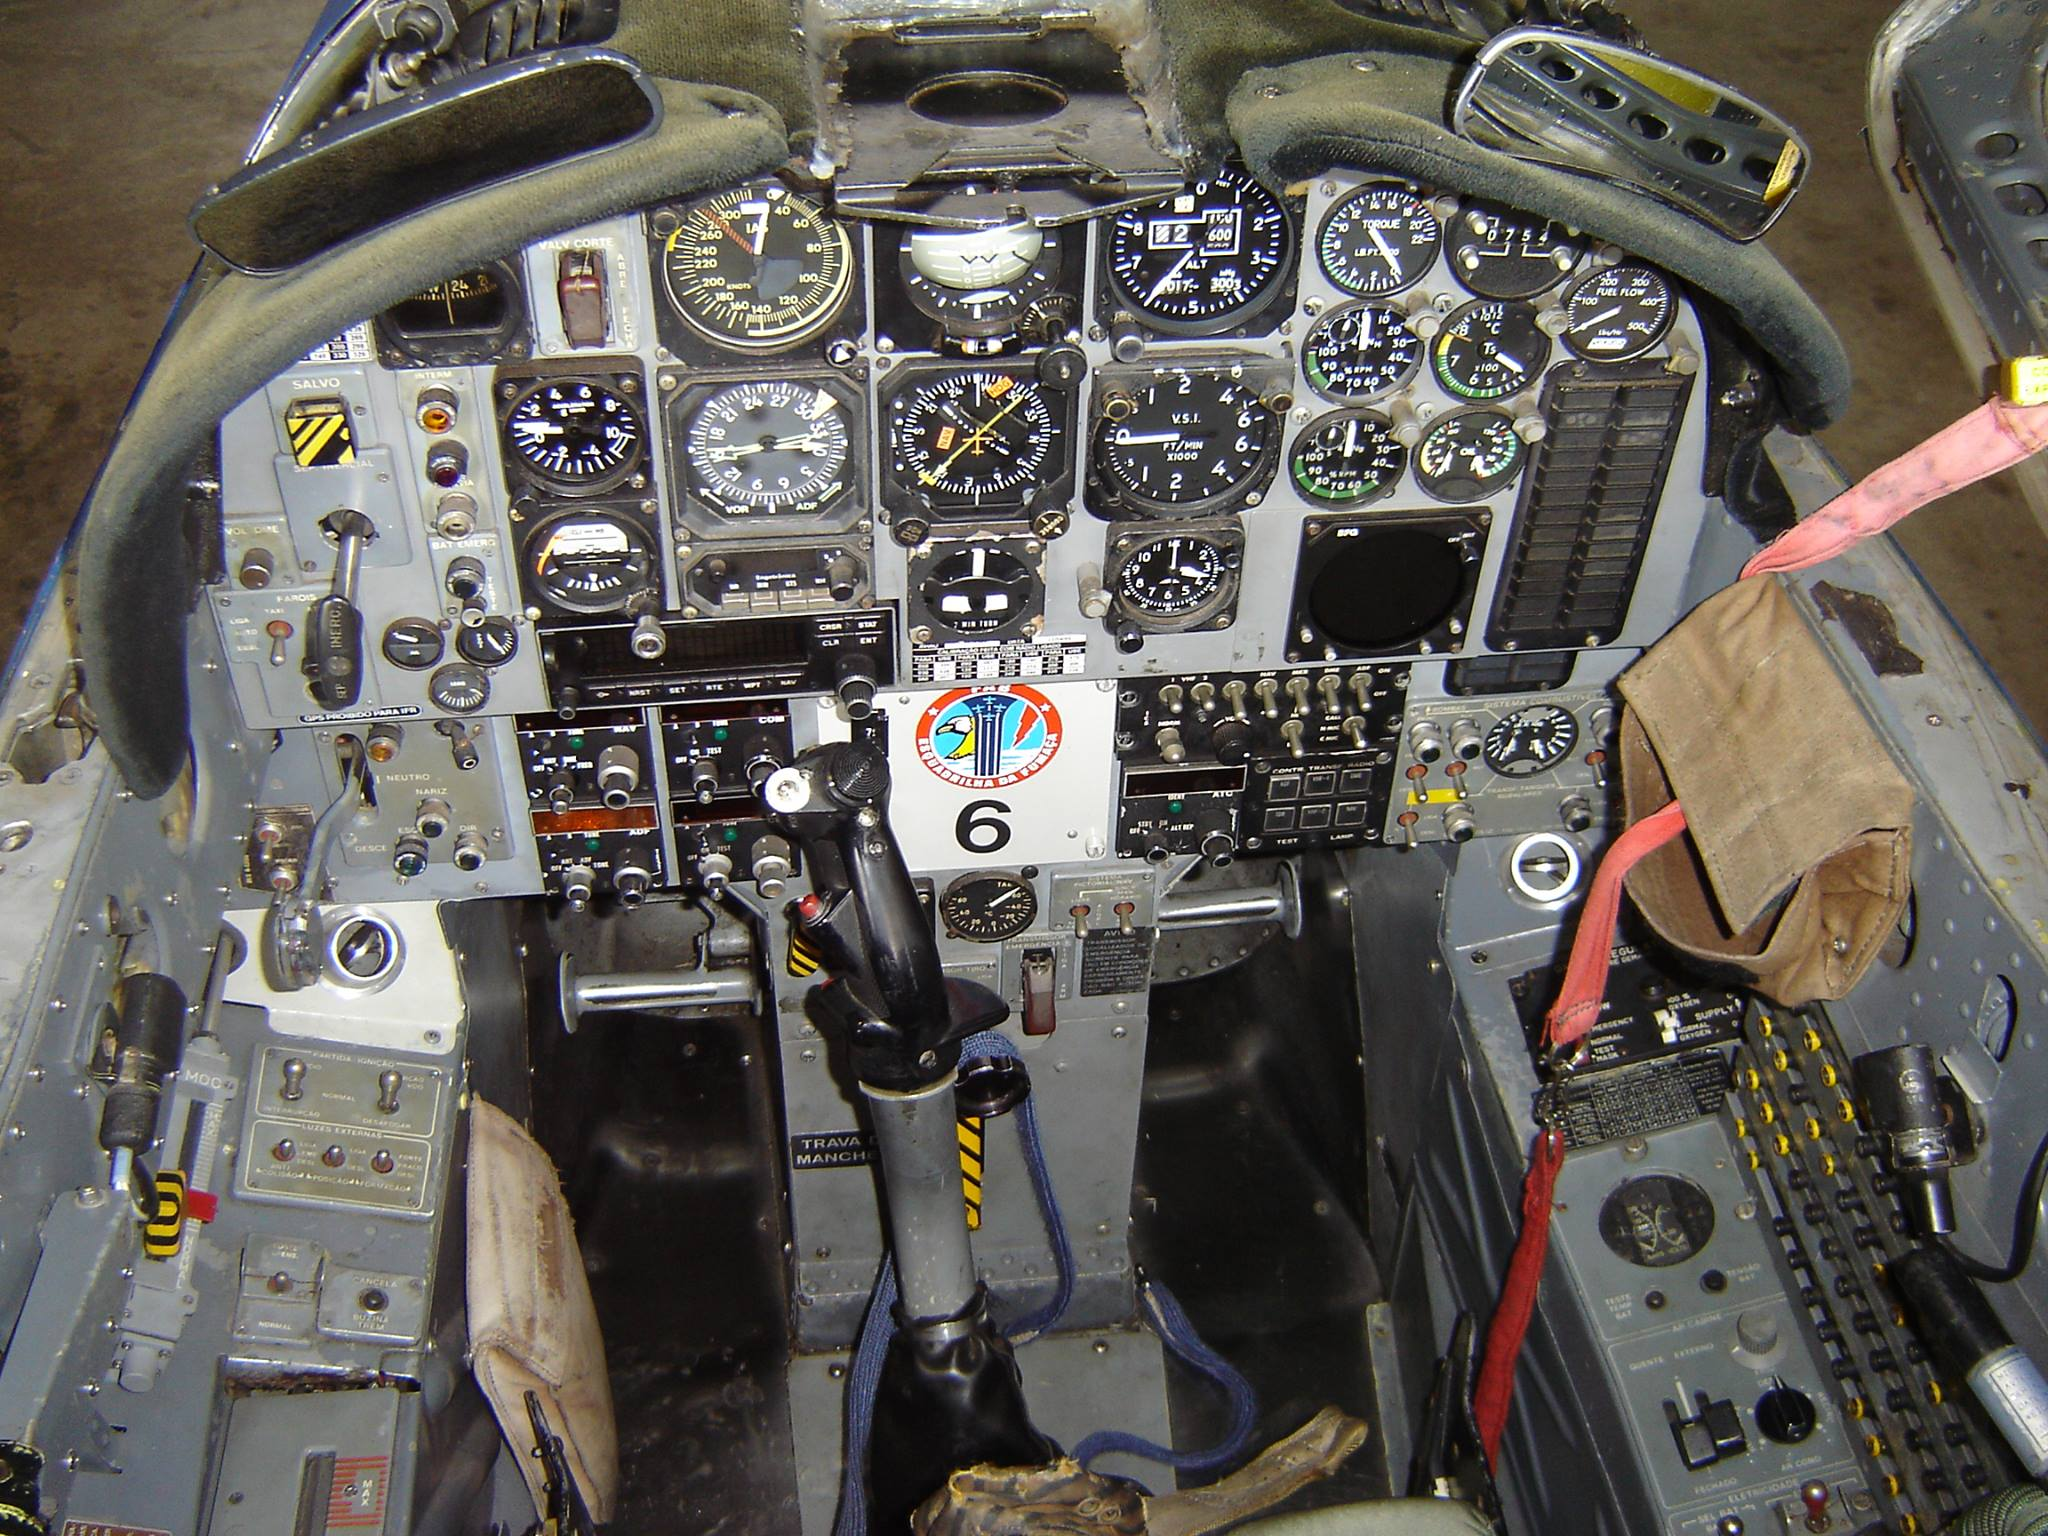 FUERZA AEREA HONDUREÑA (F.A.H) - Página 10 T27_cockpit